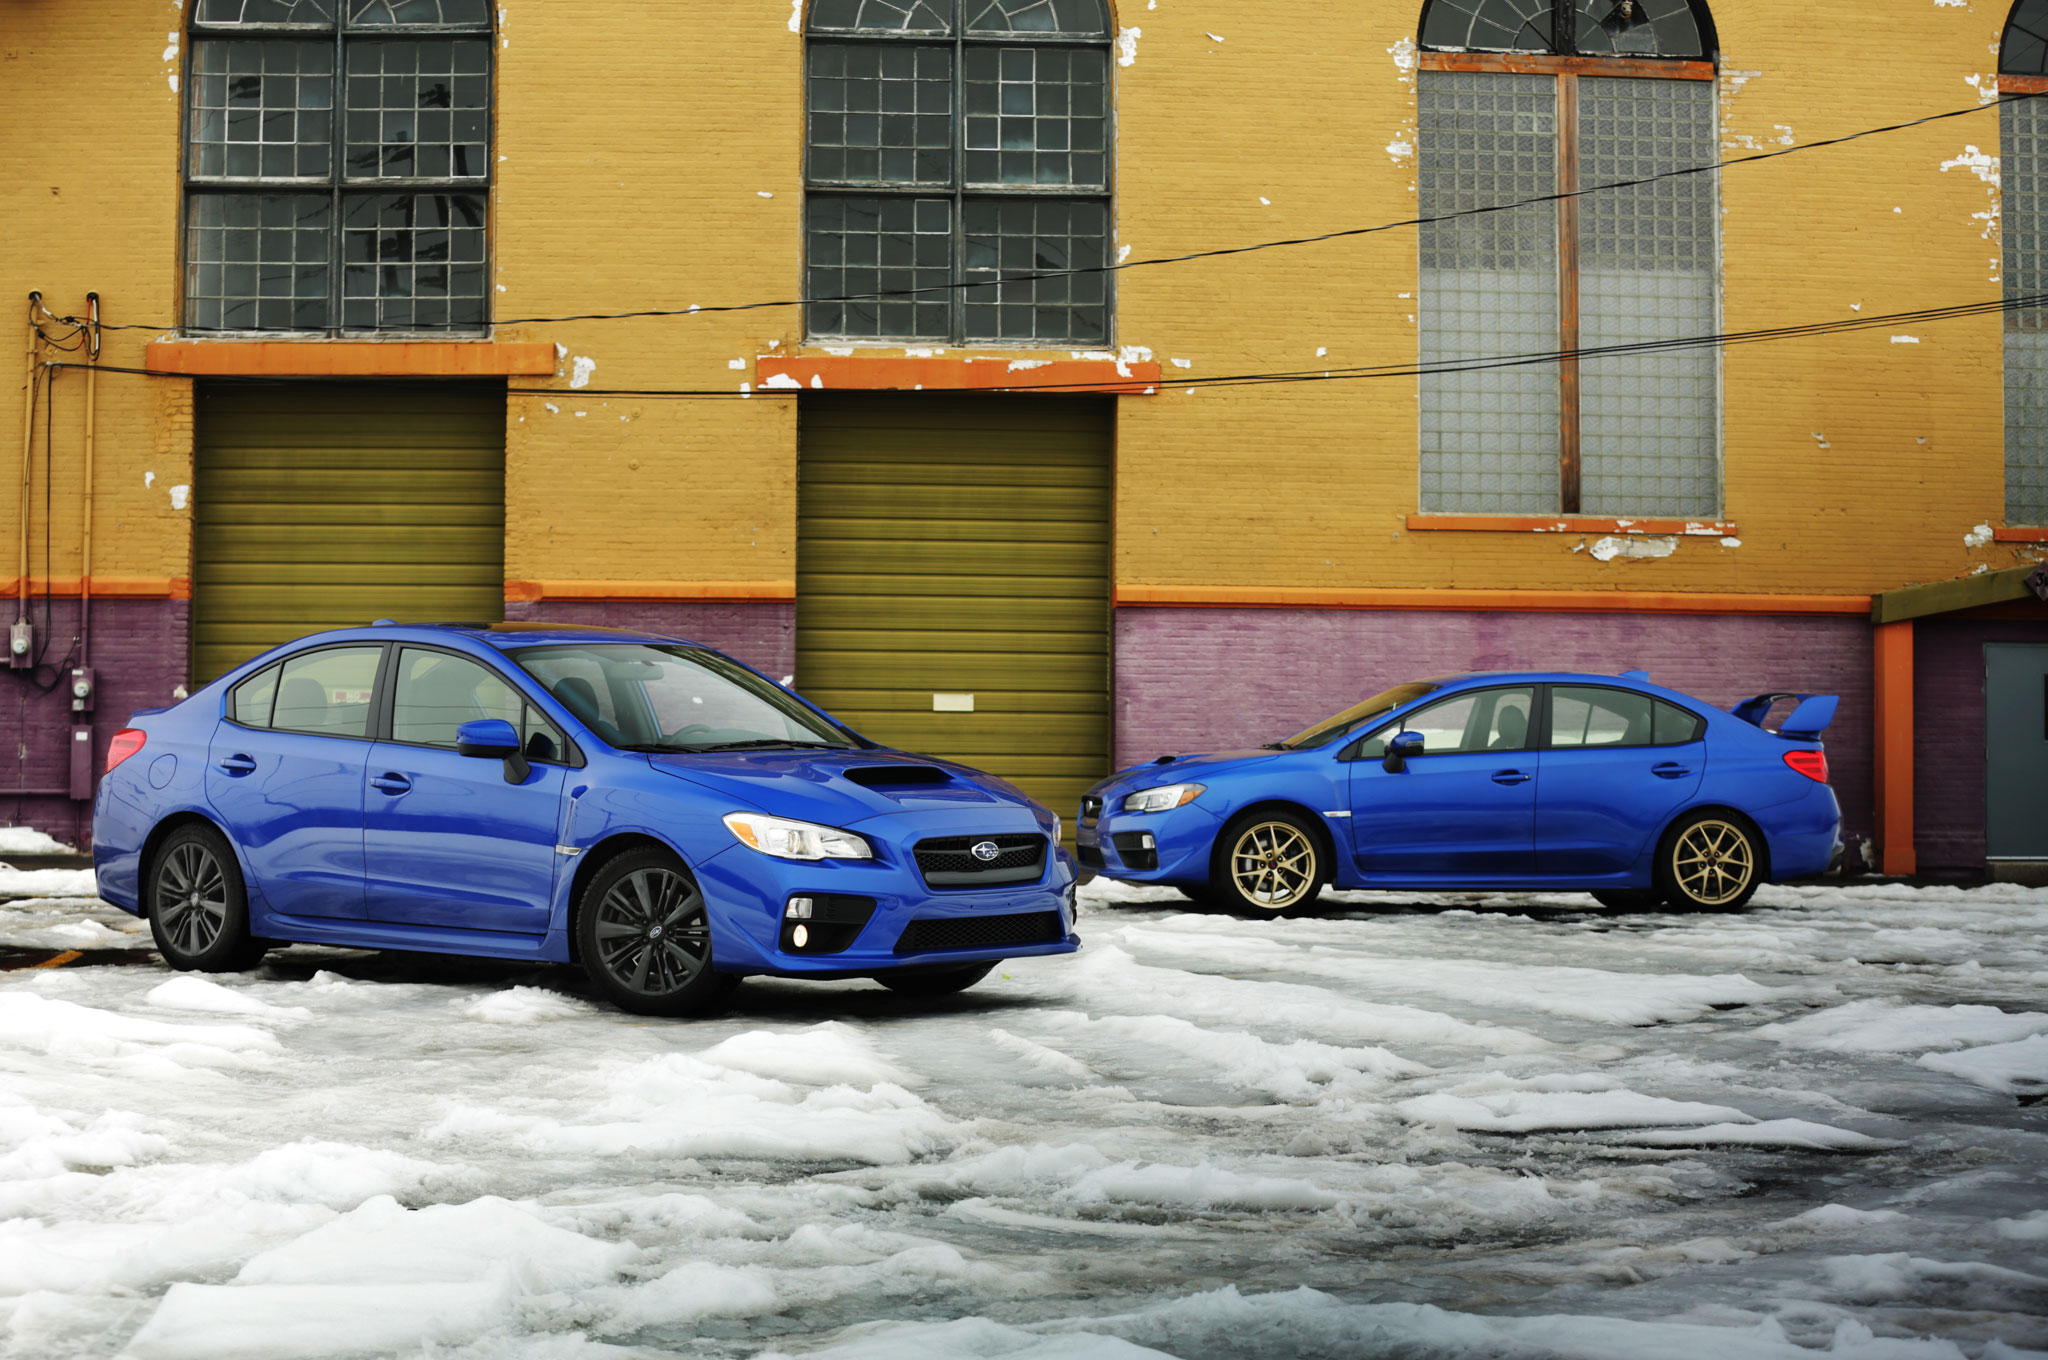 2015 Subaru Wrx Premium Is The Sti The Better Rex